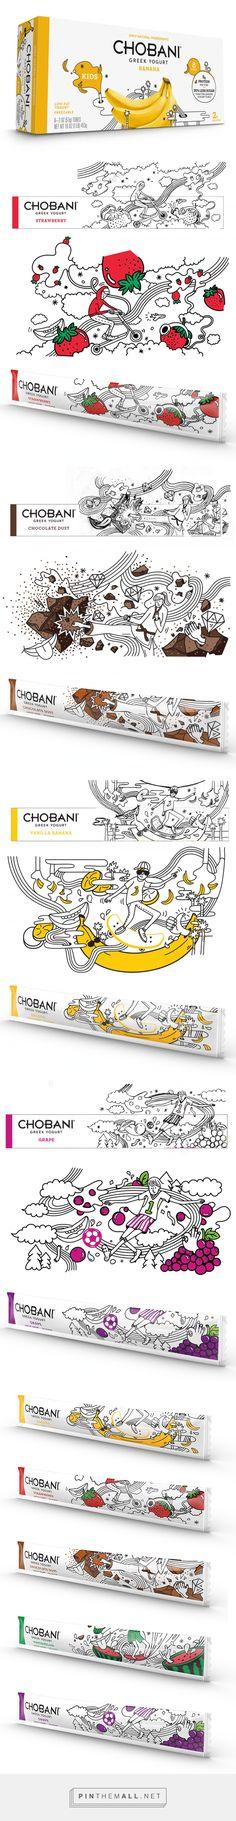 Chobani Yogurt Kids  — The Dieline - Branding & Packaging - created via http://pinthemall.net